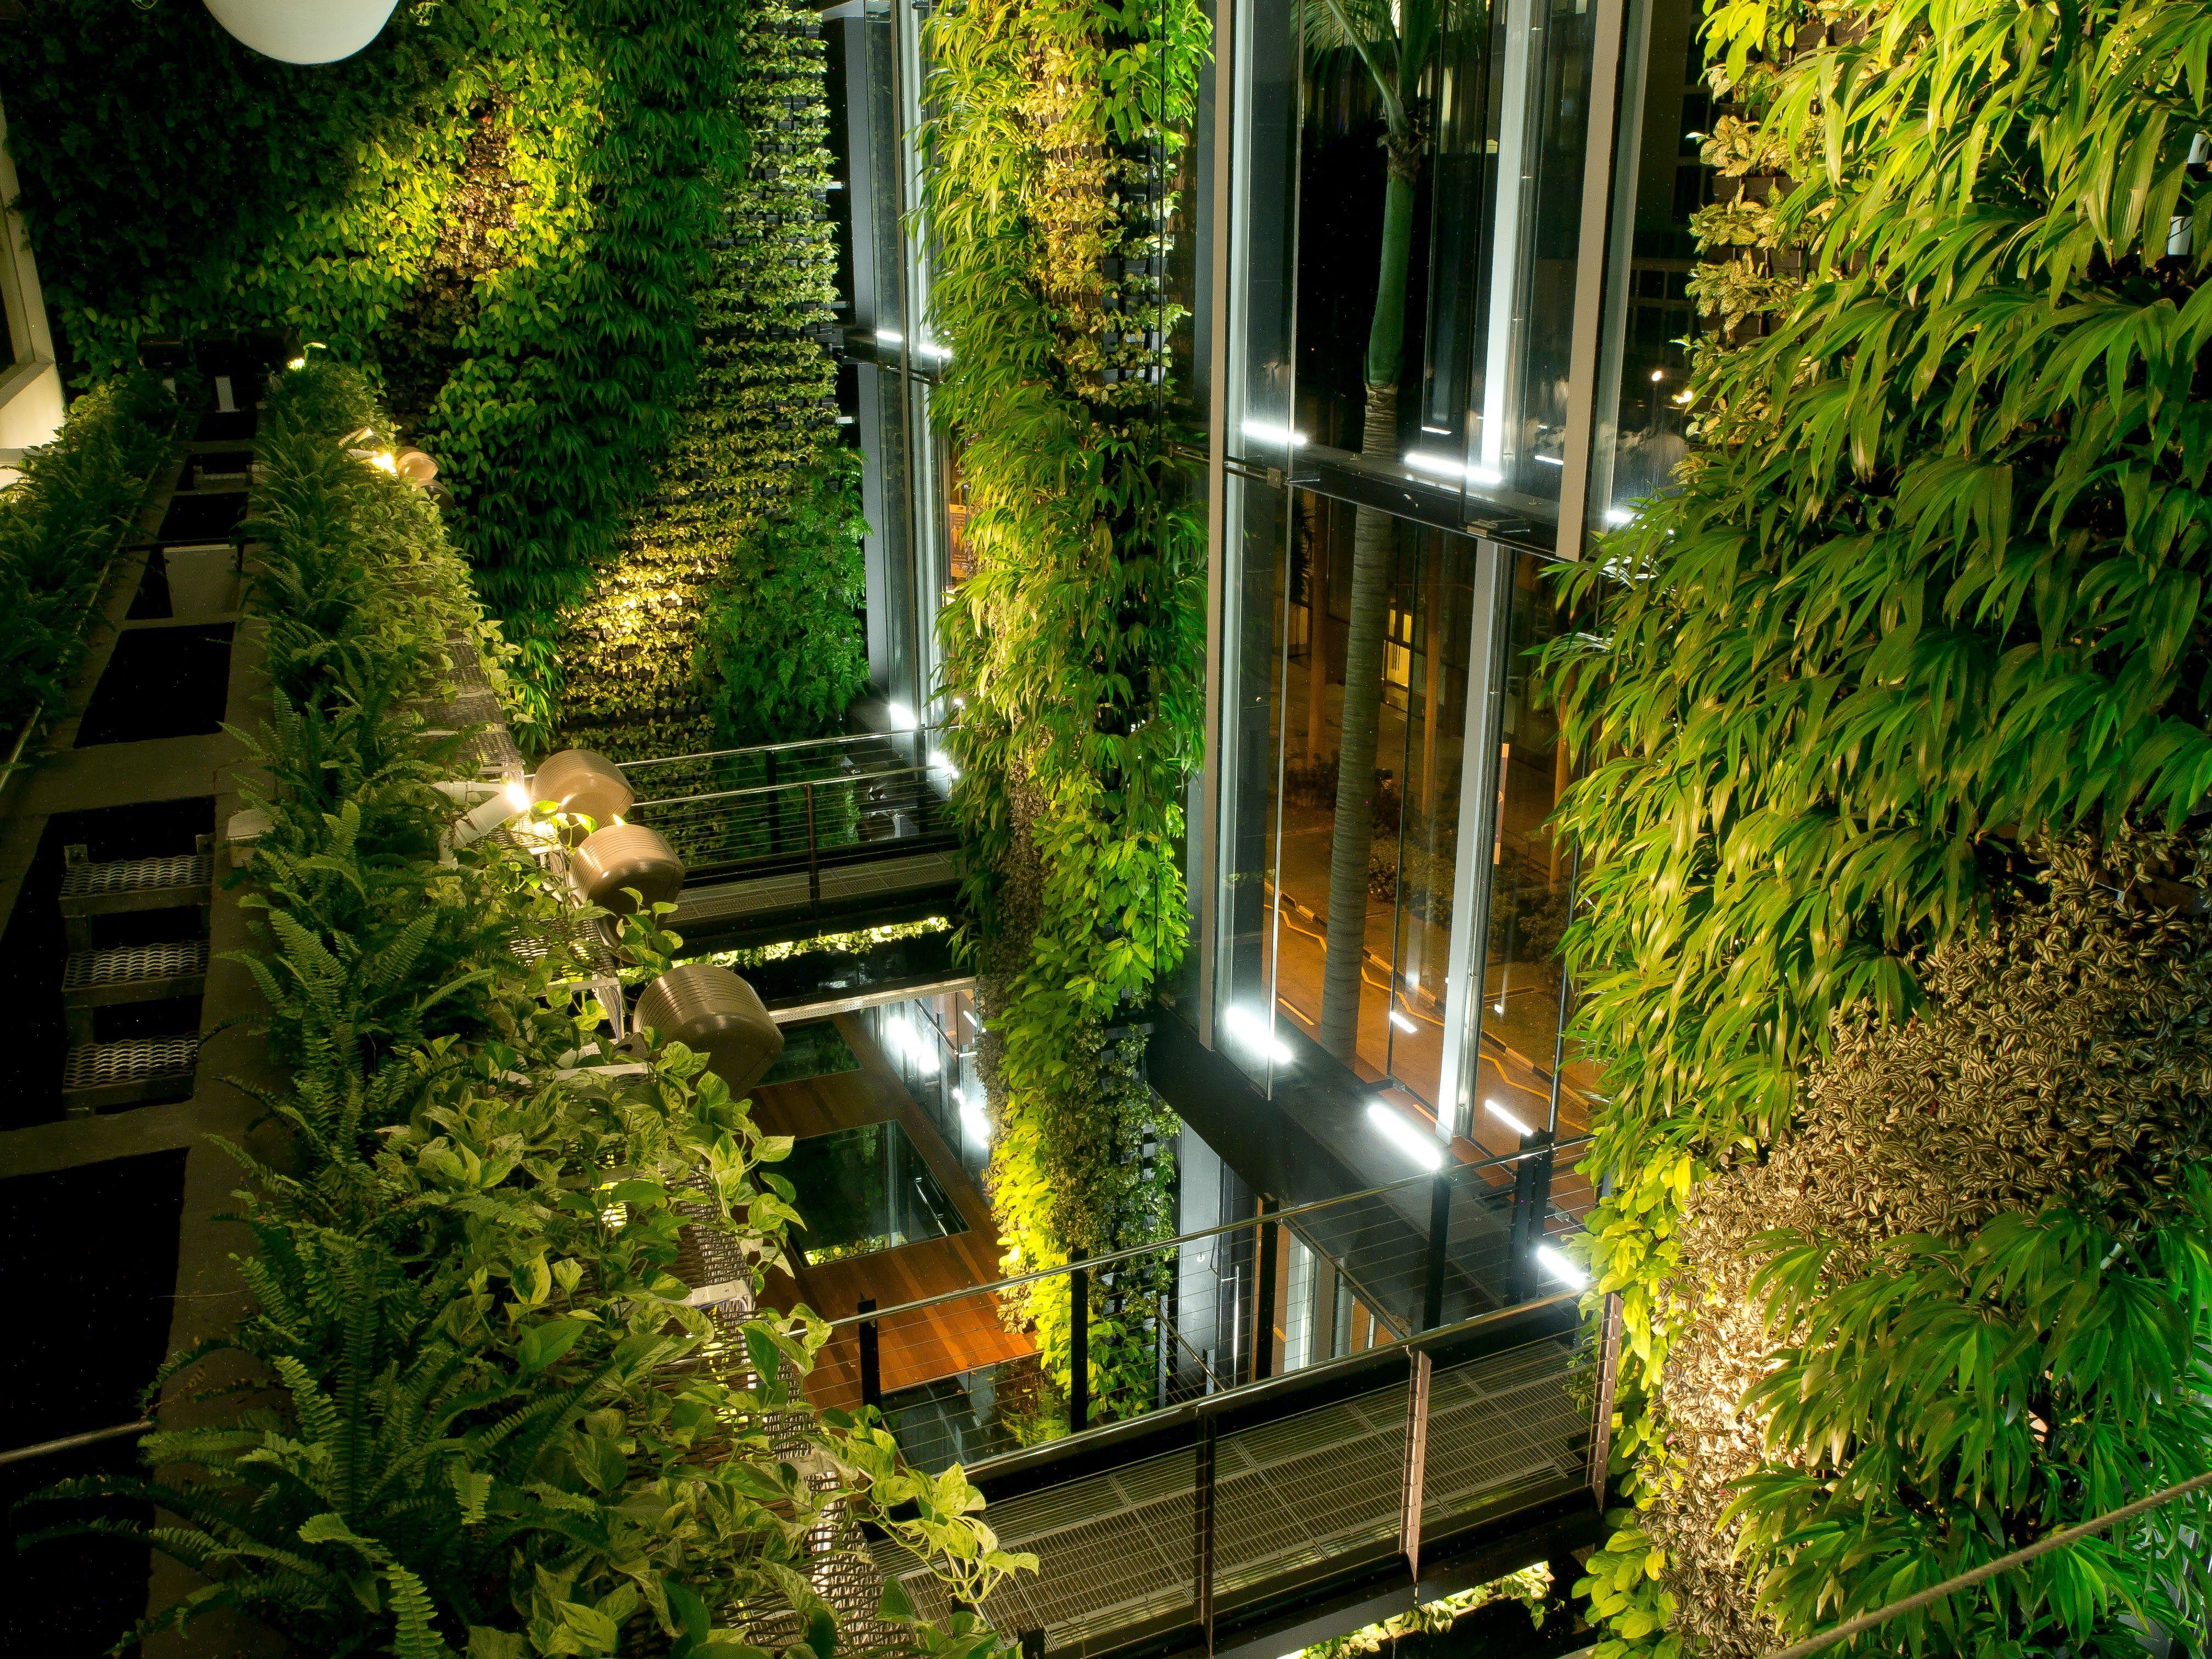 http//designsalad.info/wpcontent/uploads/2013/08/Hanging